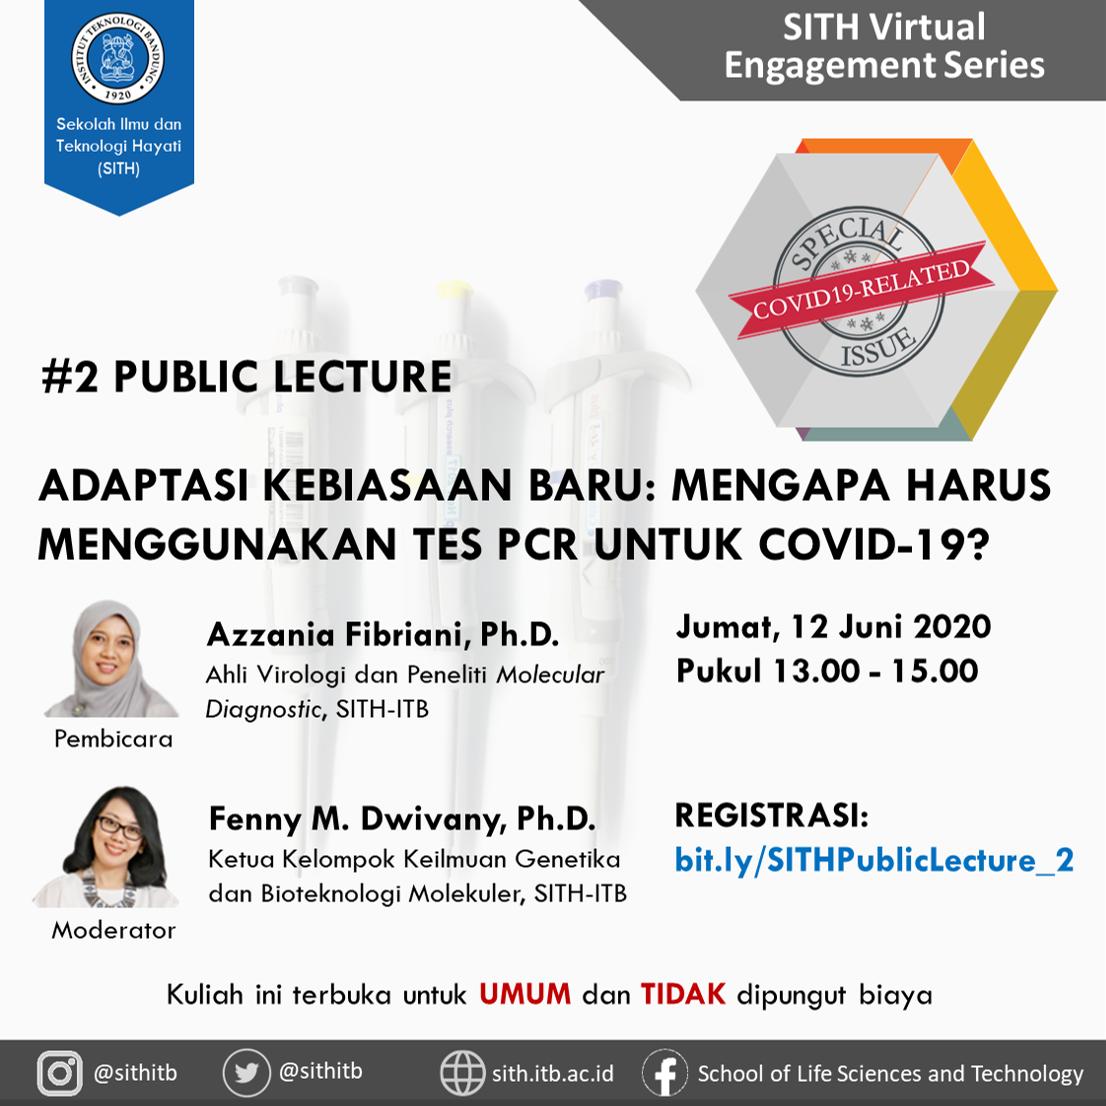 SITH VIRTUAL ENGAGEMENT SERIES Virtual Public Lecture Series #2